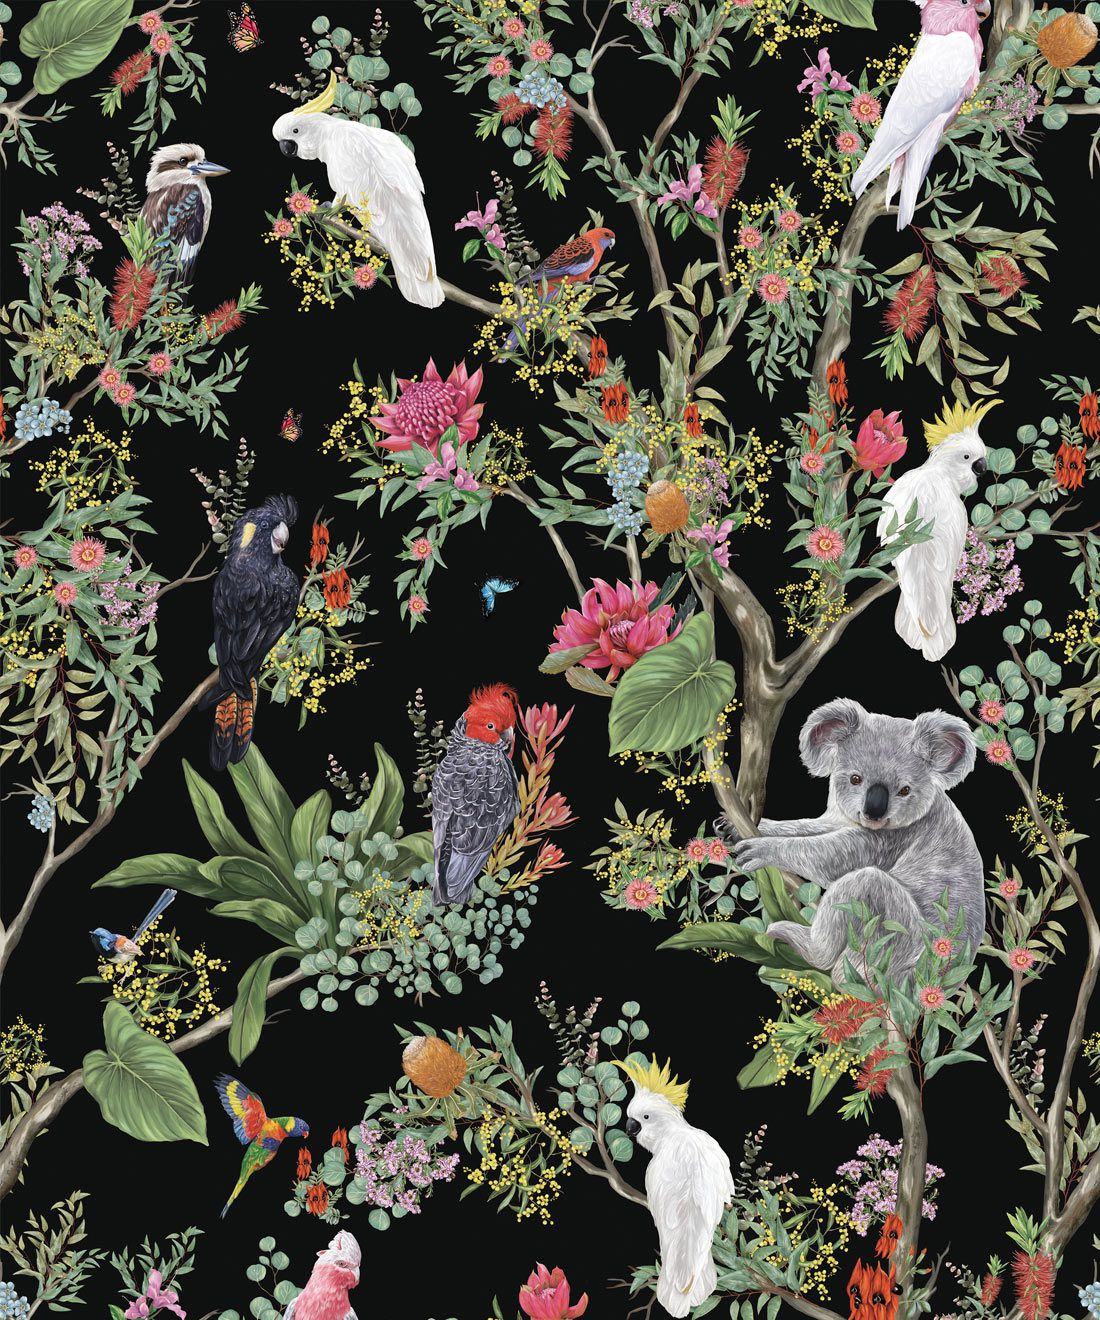 Australia Wallpaper • Cockatoos, Koalas, Parrots, Finches • Milton & King USA • Black Wallpaper Swatch